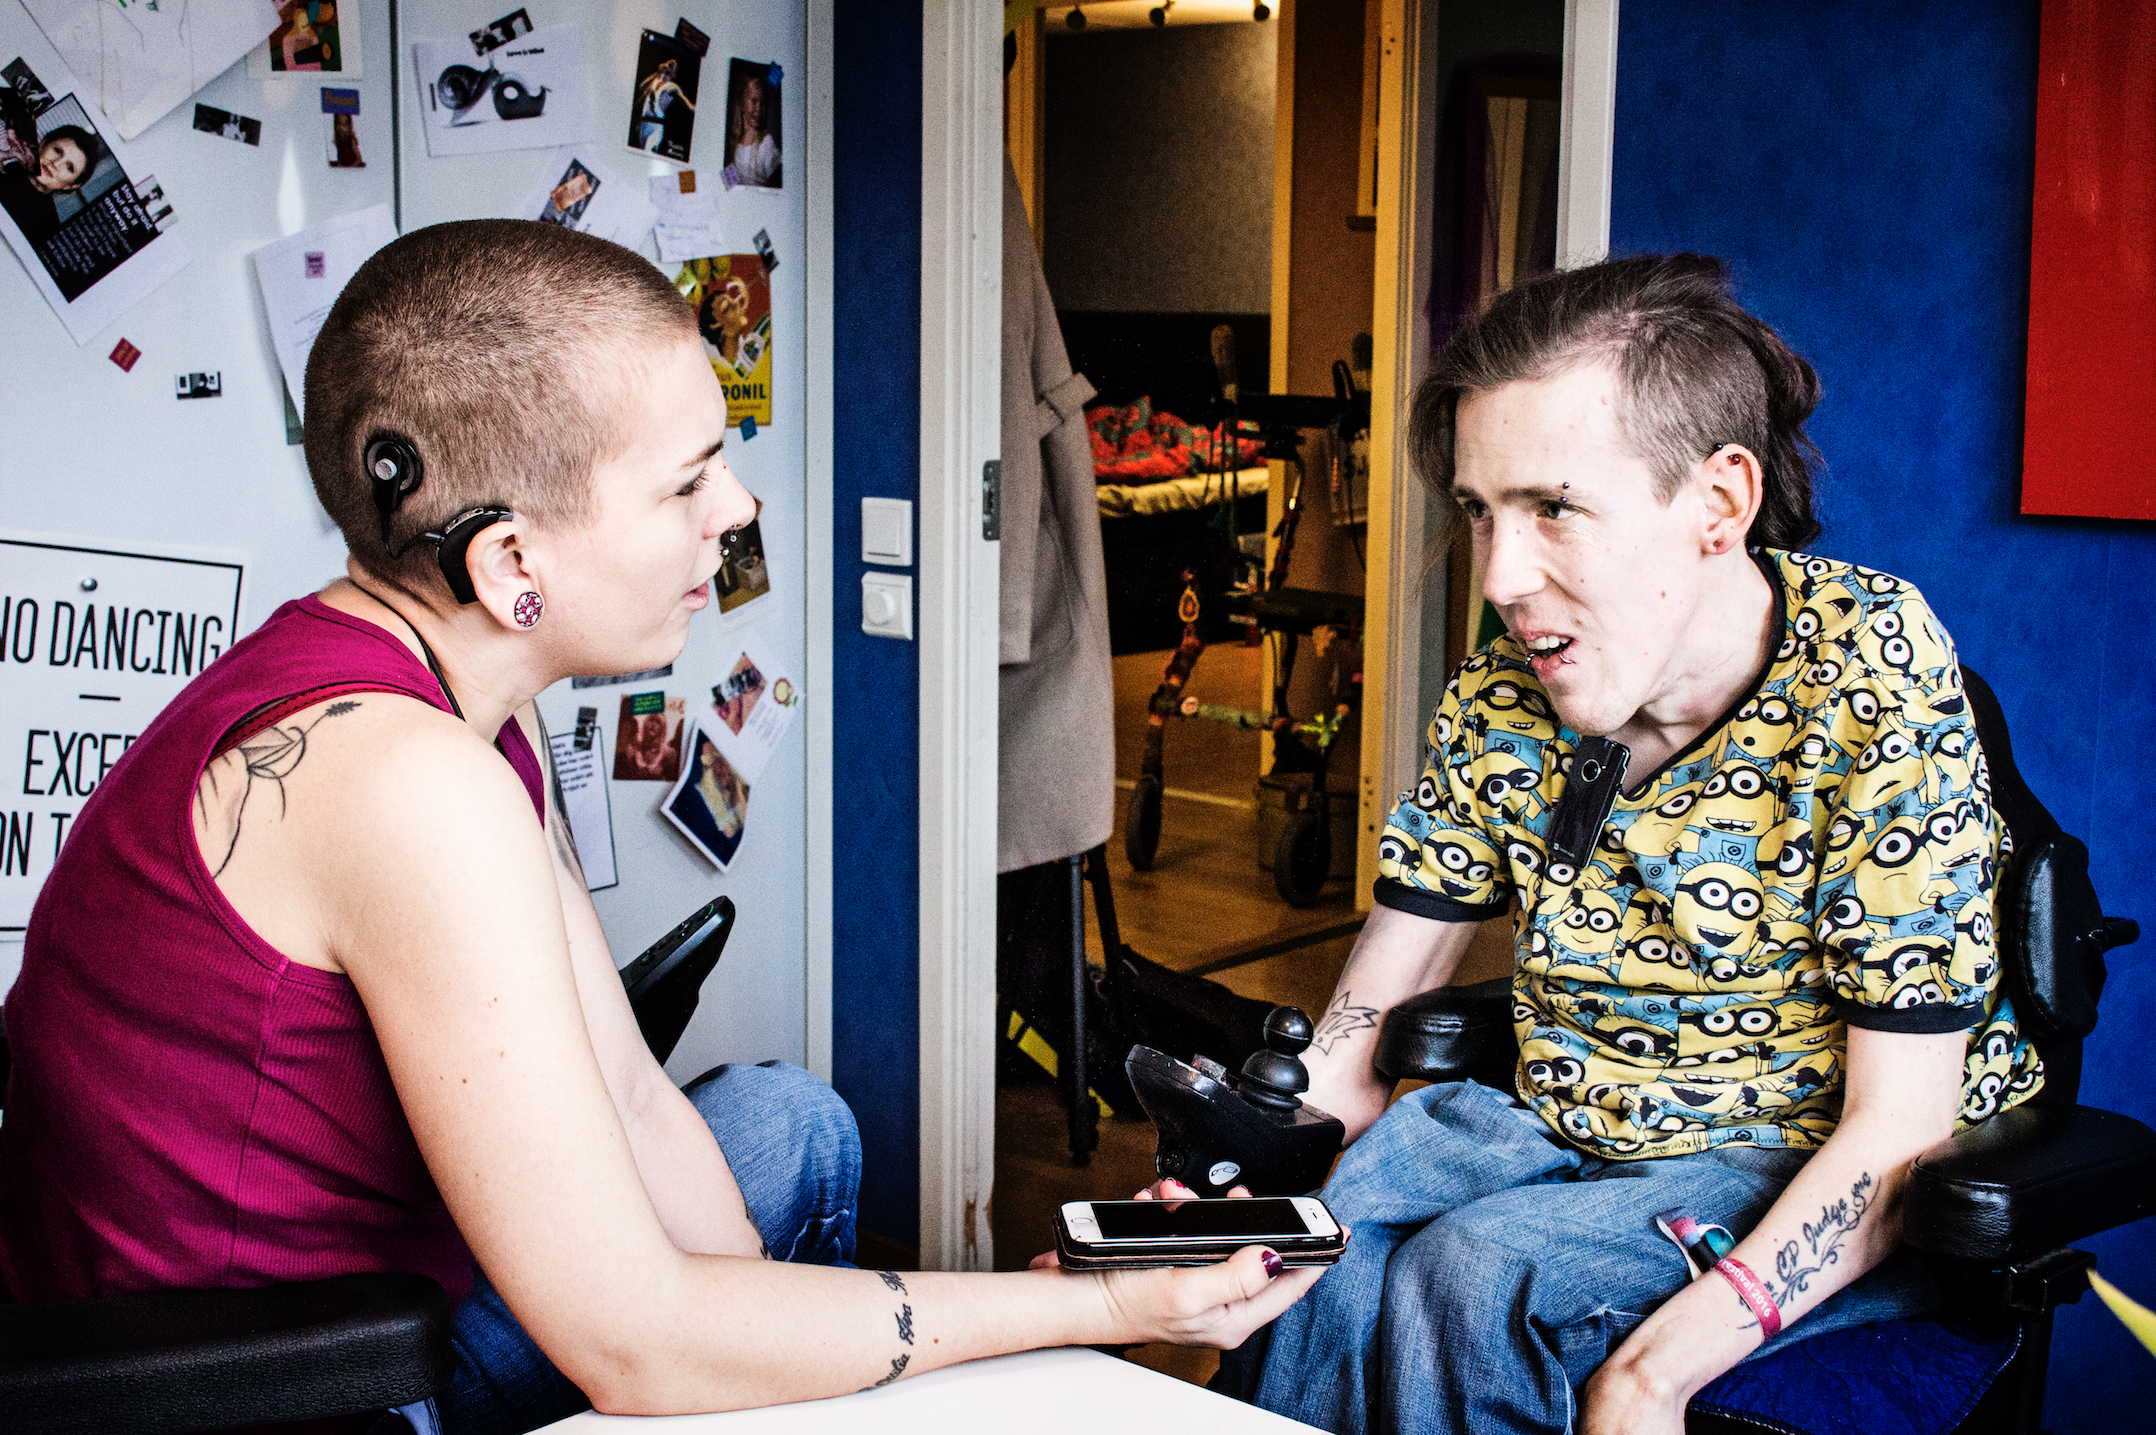 Anders Eriksson intervjuas av Frida Ingha i hennes kök, båda sitter i sina rullstolar.